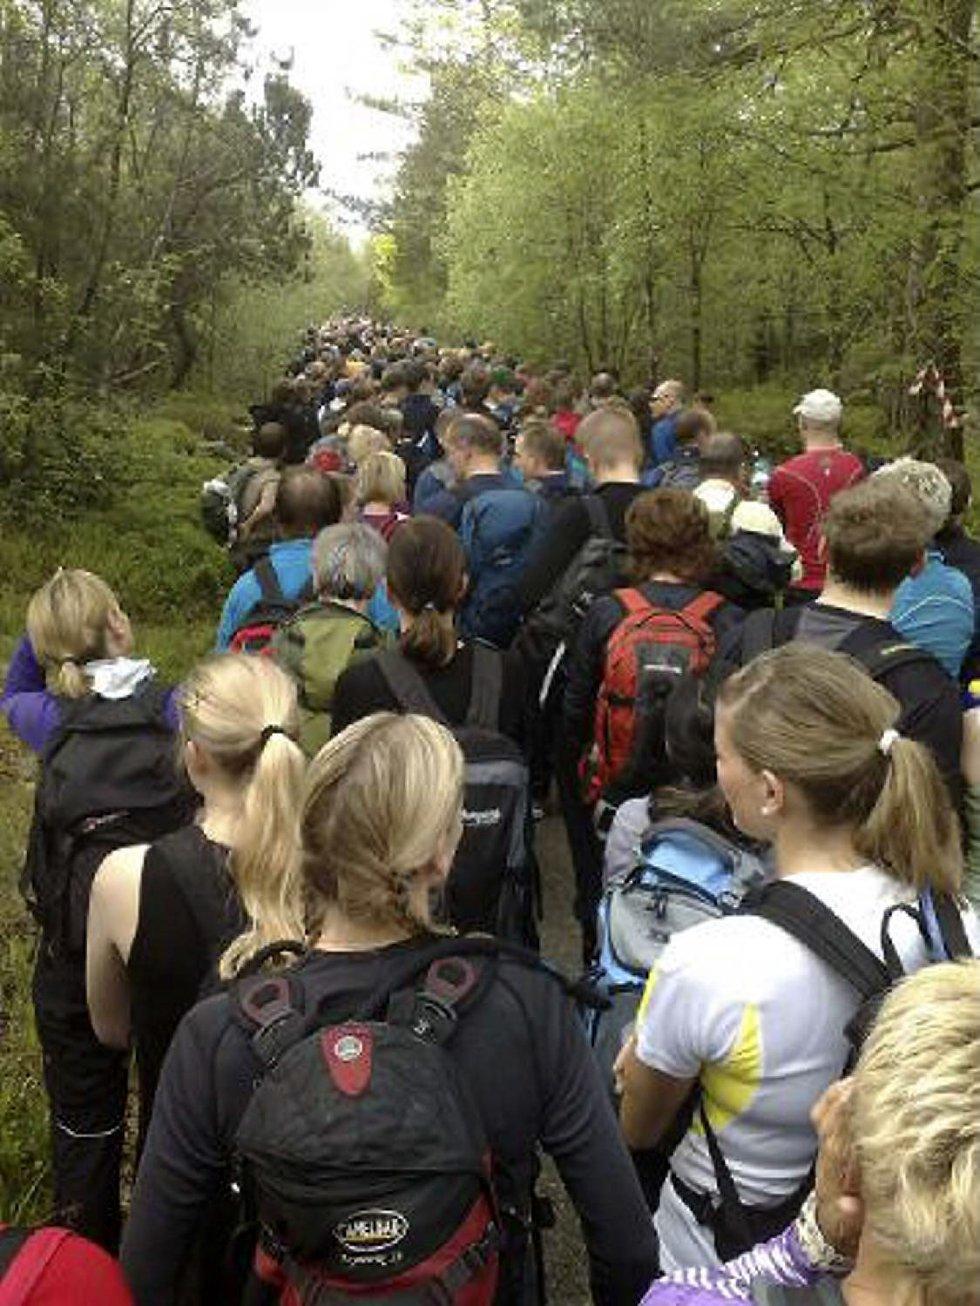 5500 personer var forhåndspåmeldt til årets 7-fjellstur (24.05.09). (Foto: Stian Espeland (MMS))